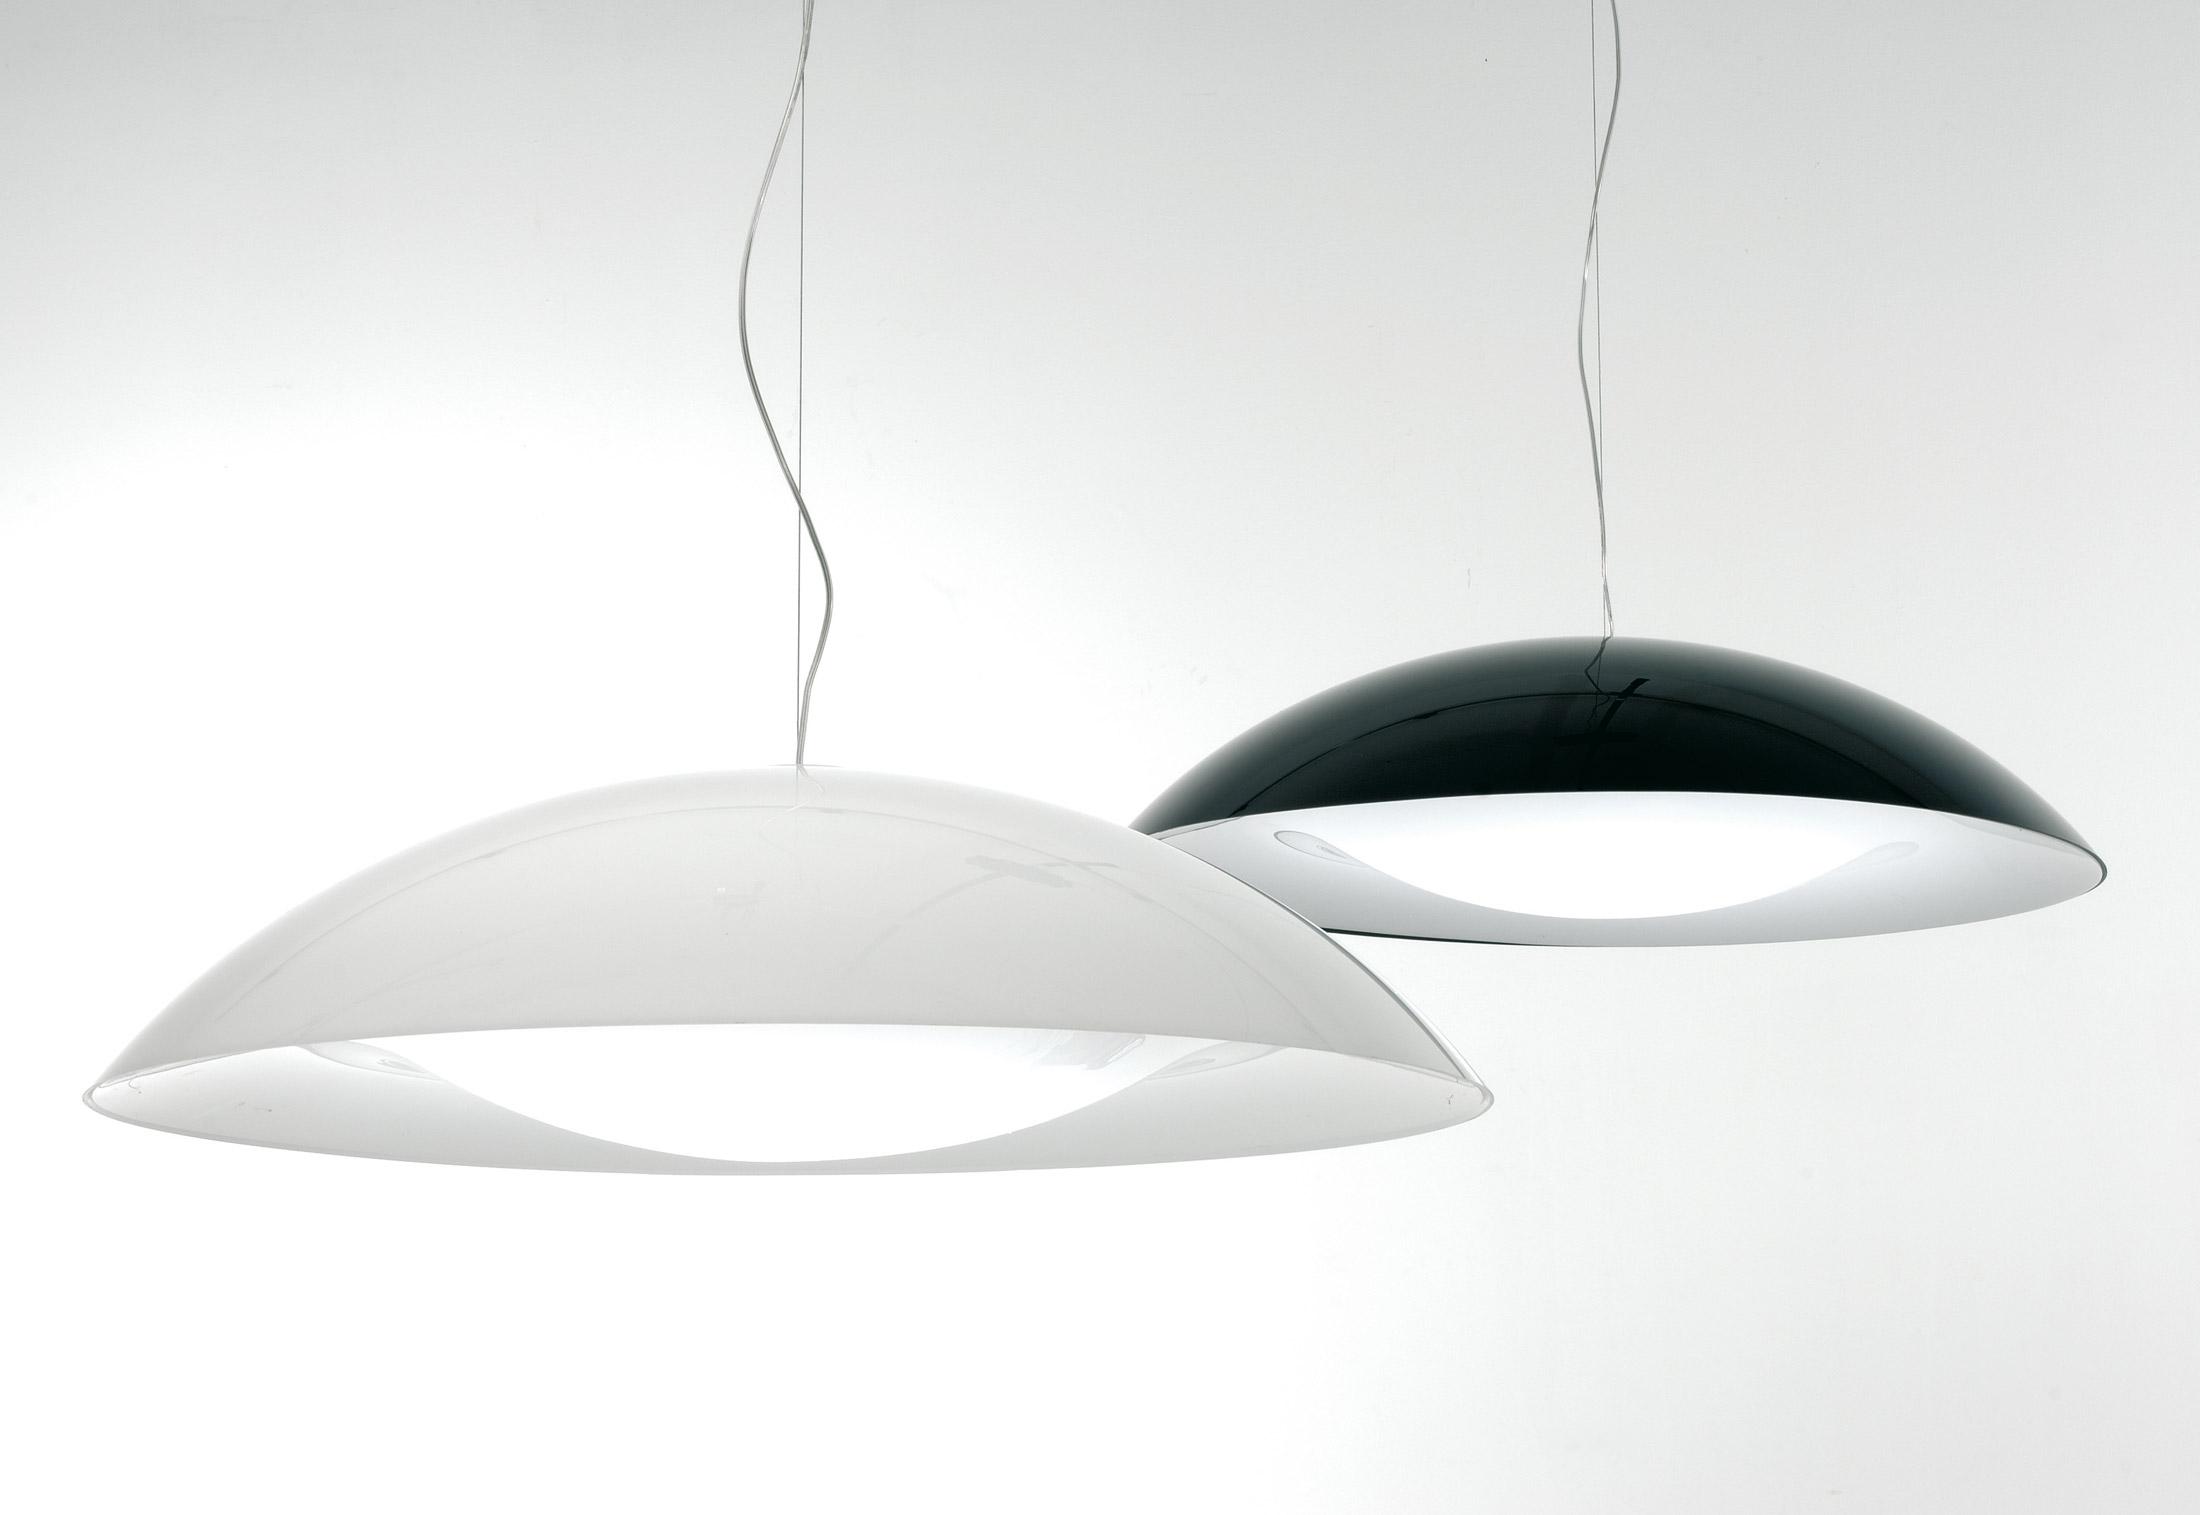 Forum Arredamento.it •aiuto scelta lampadario cucina